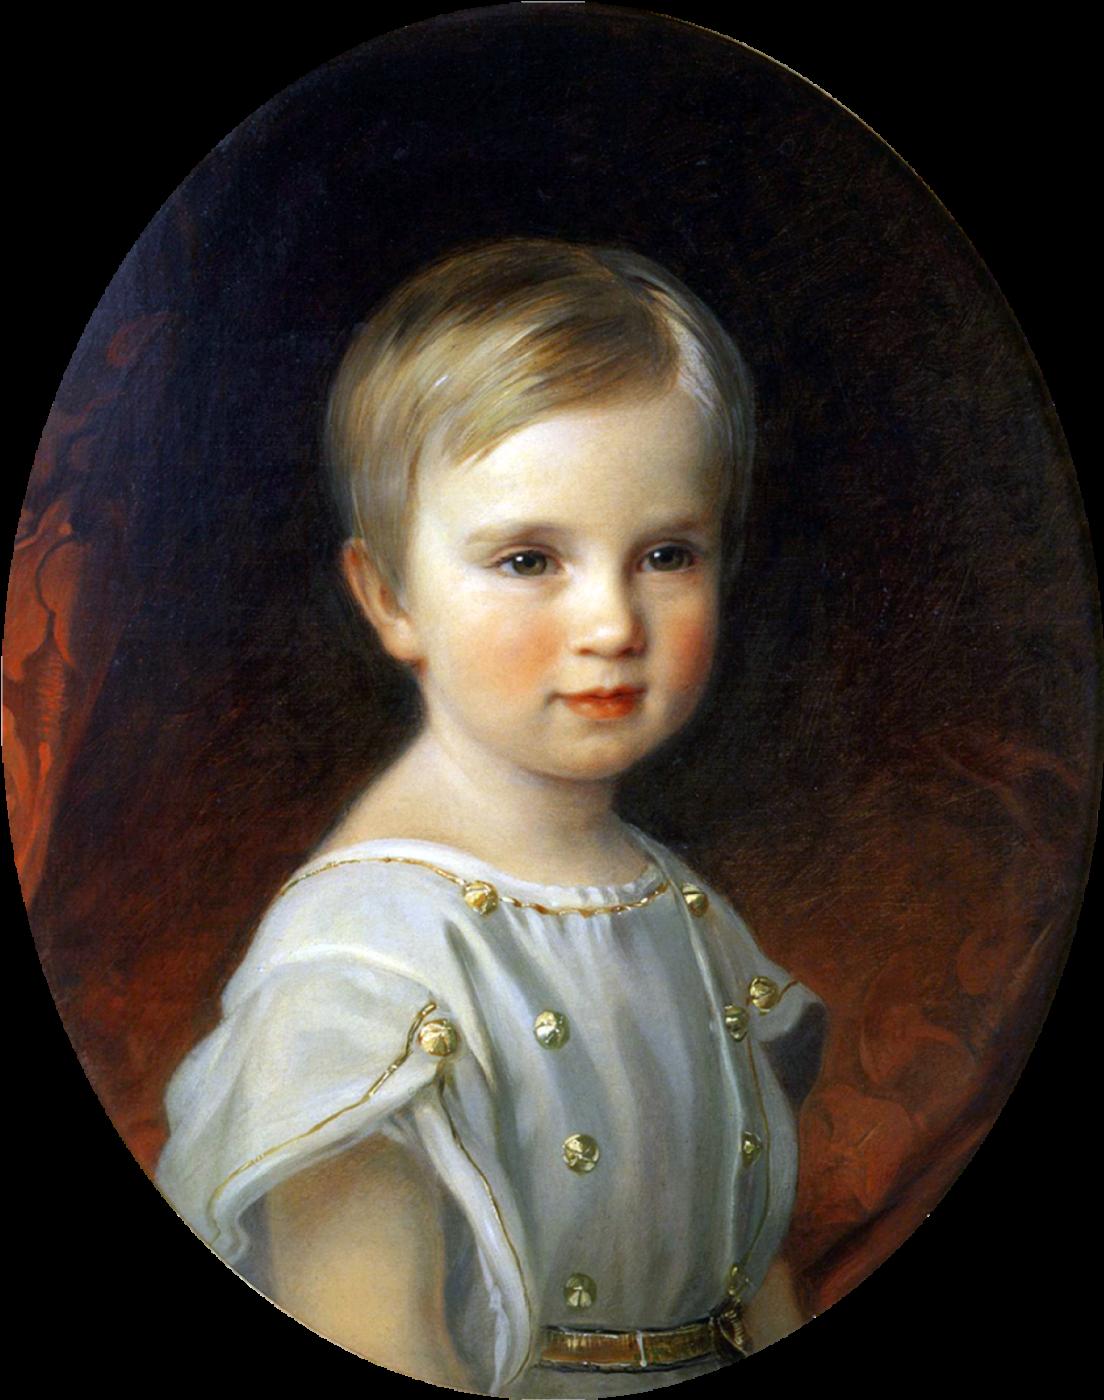 Josef Neugebauer. Crown Prince of Austria Rudolph in childhood